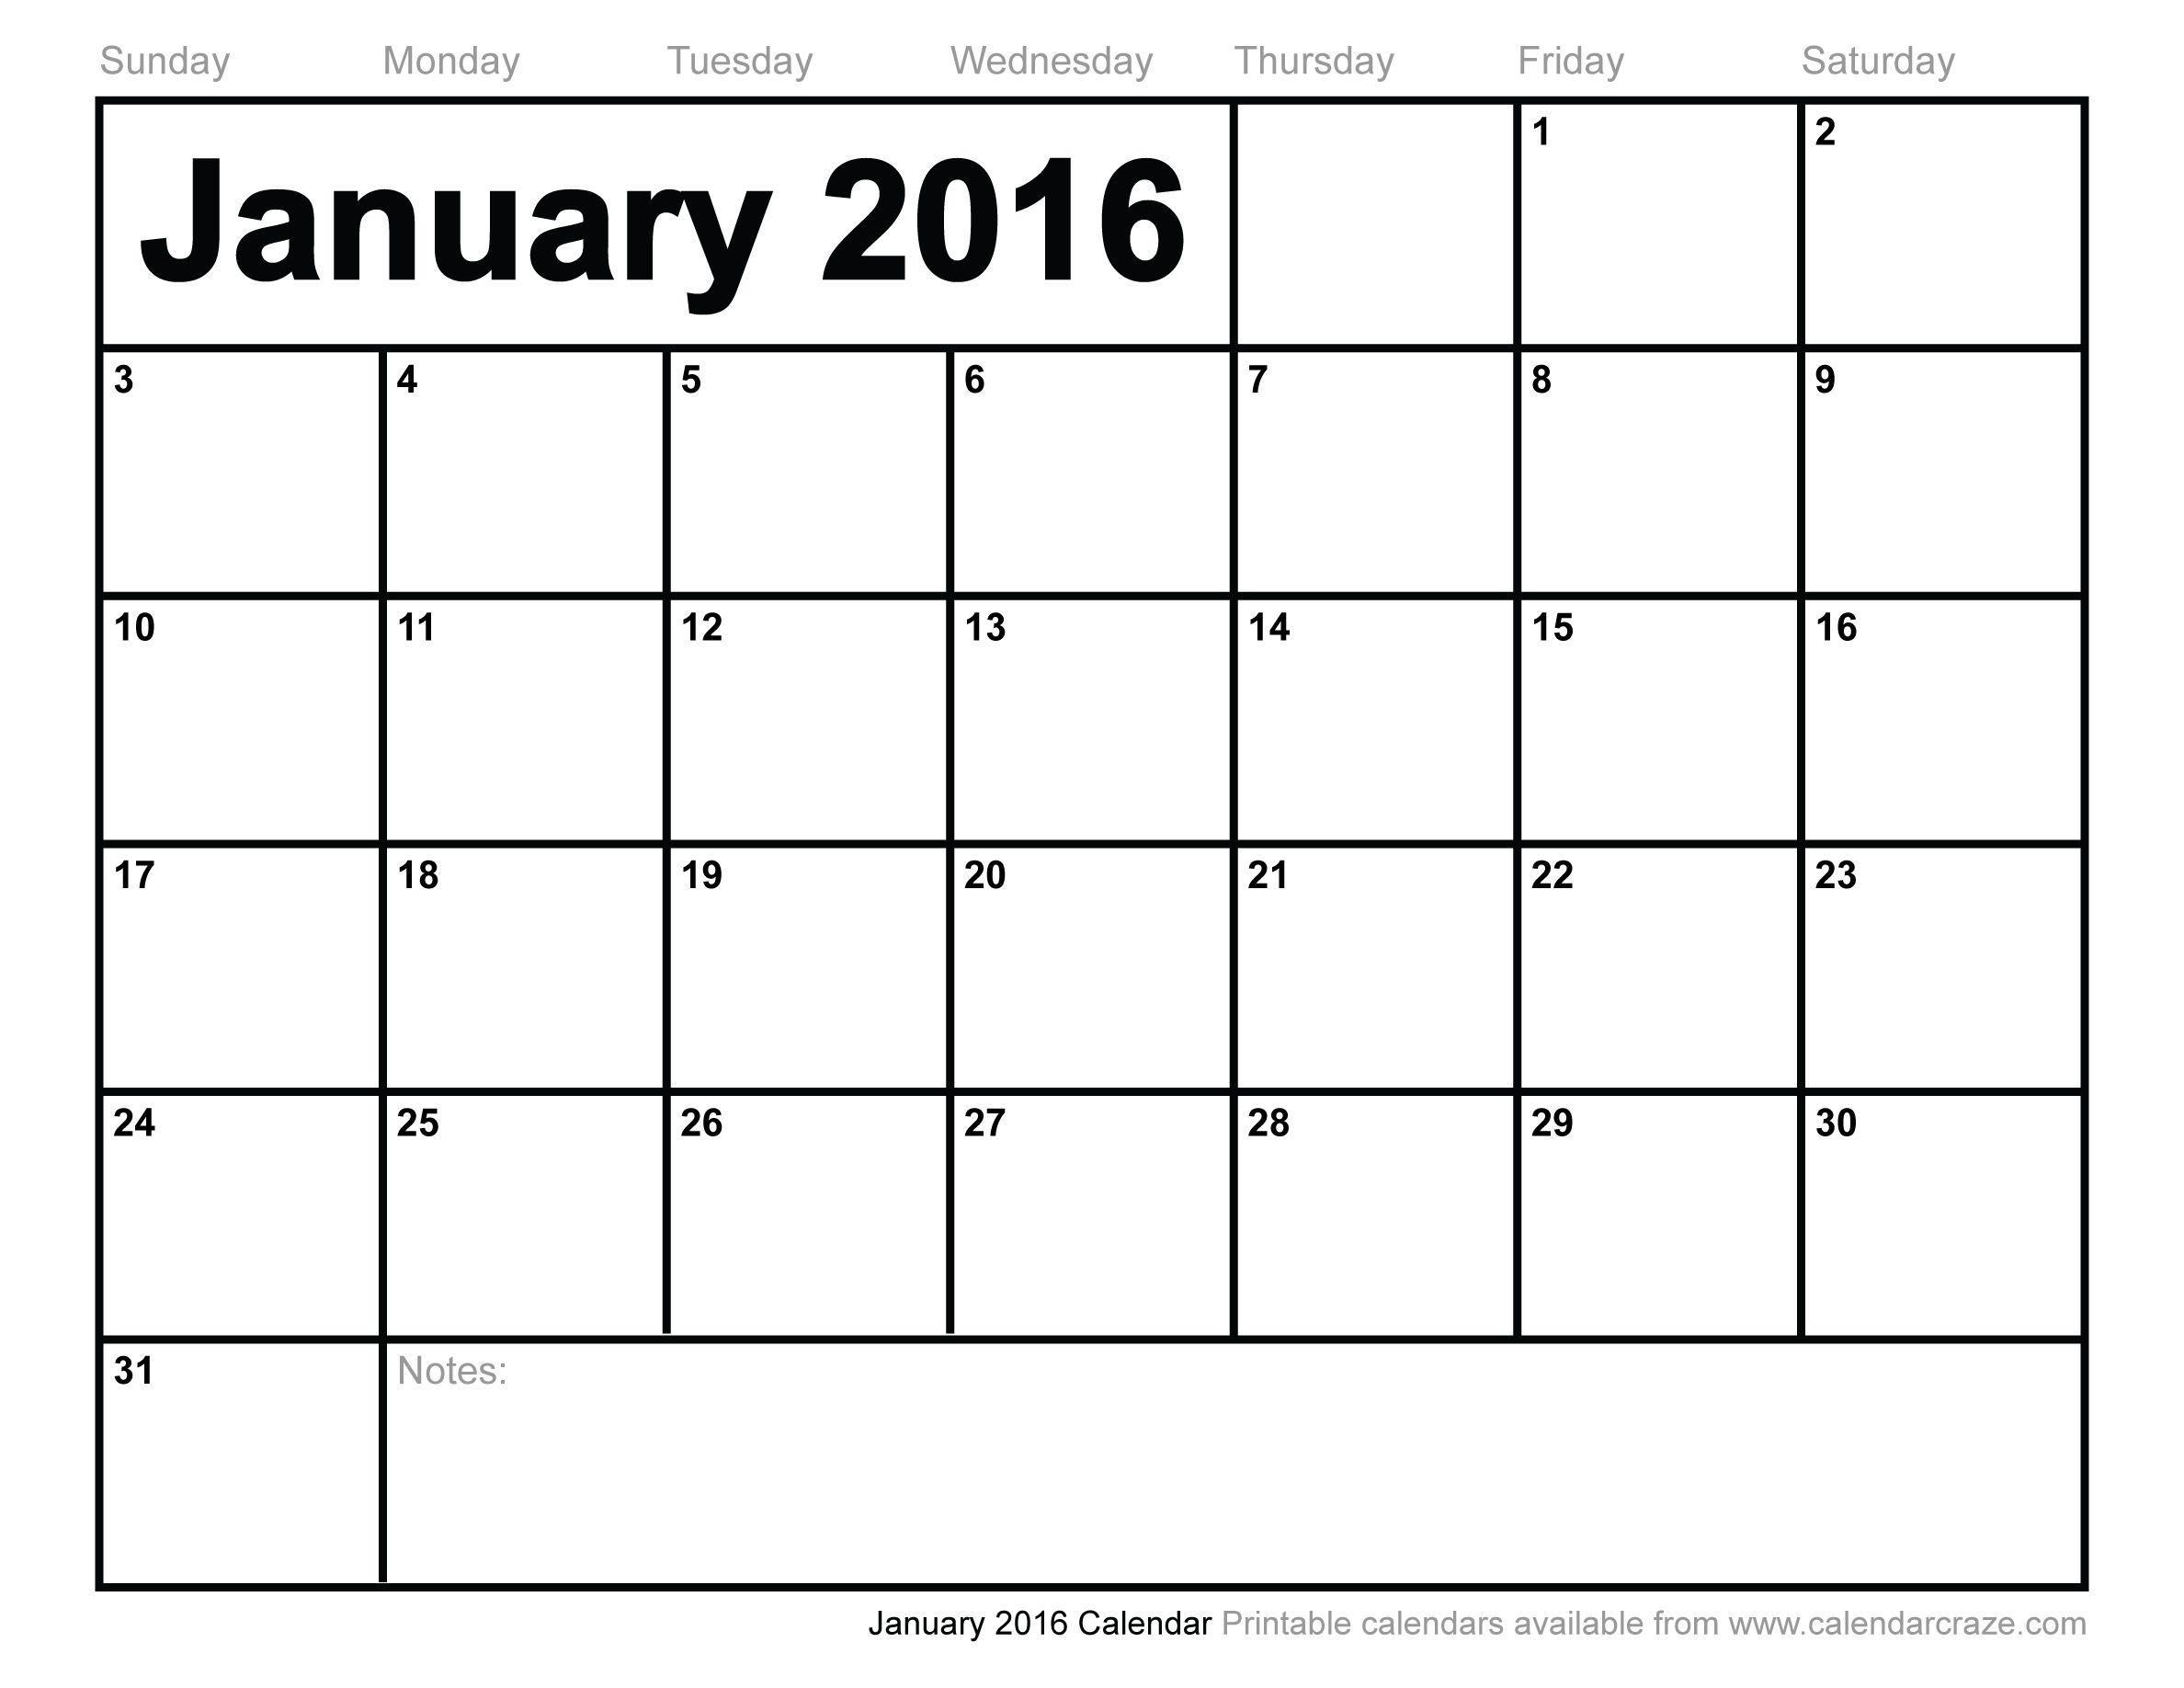 January2016Calendarprintable..awhh Shit My Bday On A throughout December 2015 Calendar Printable